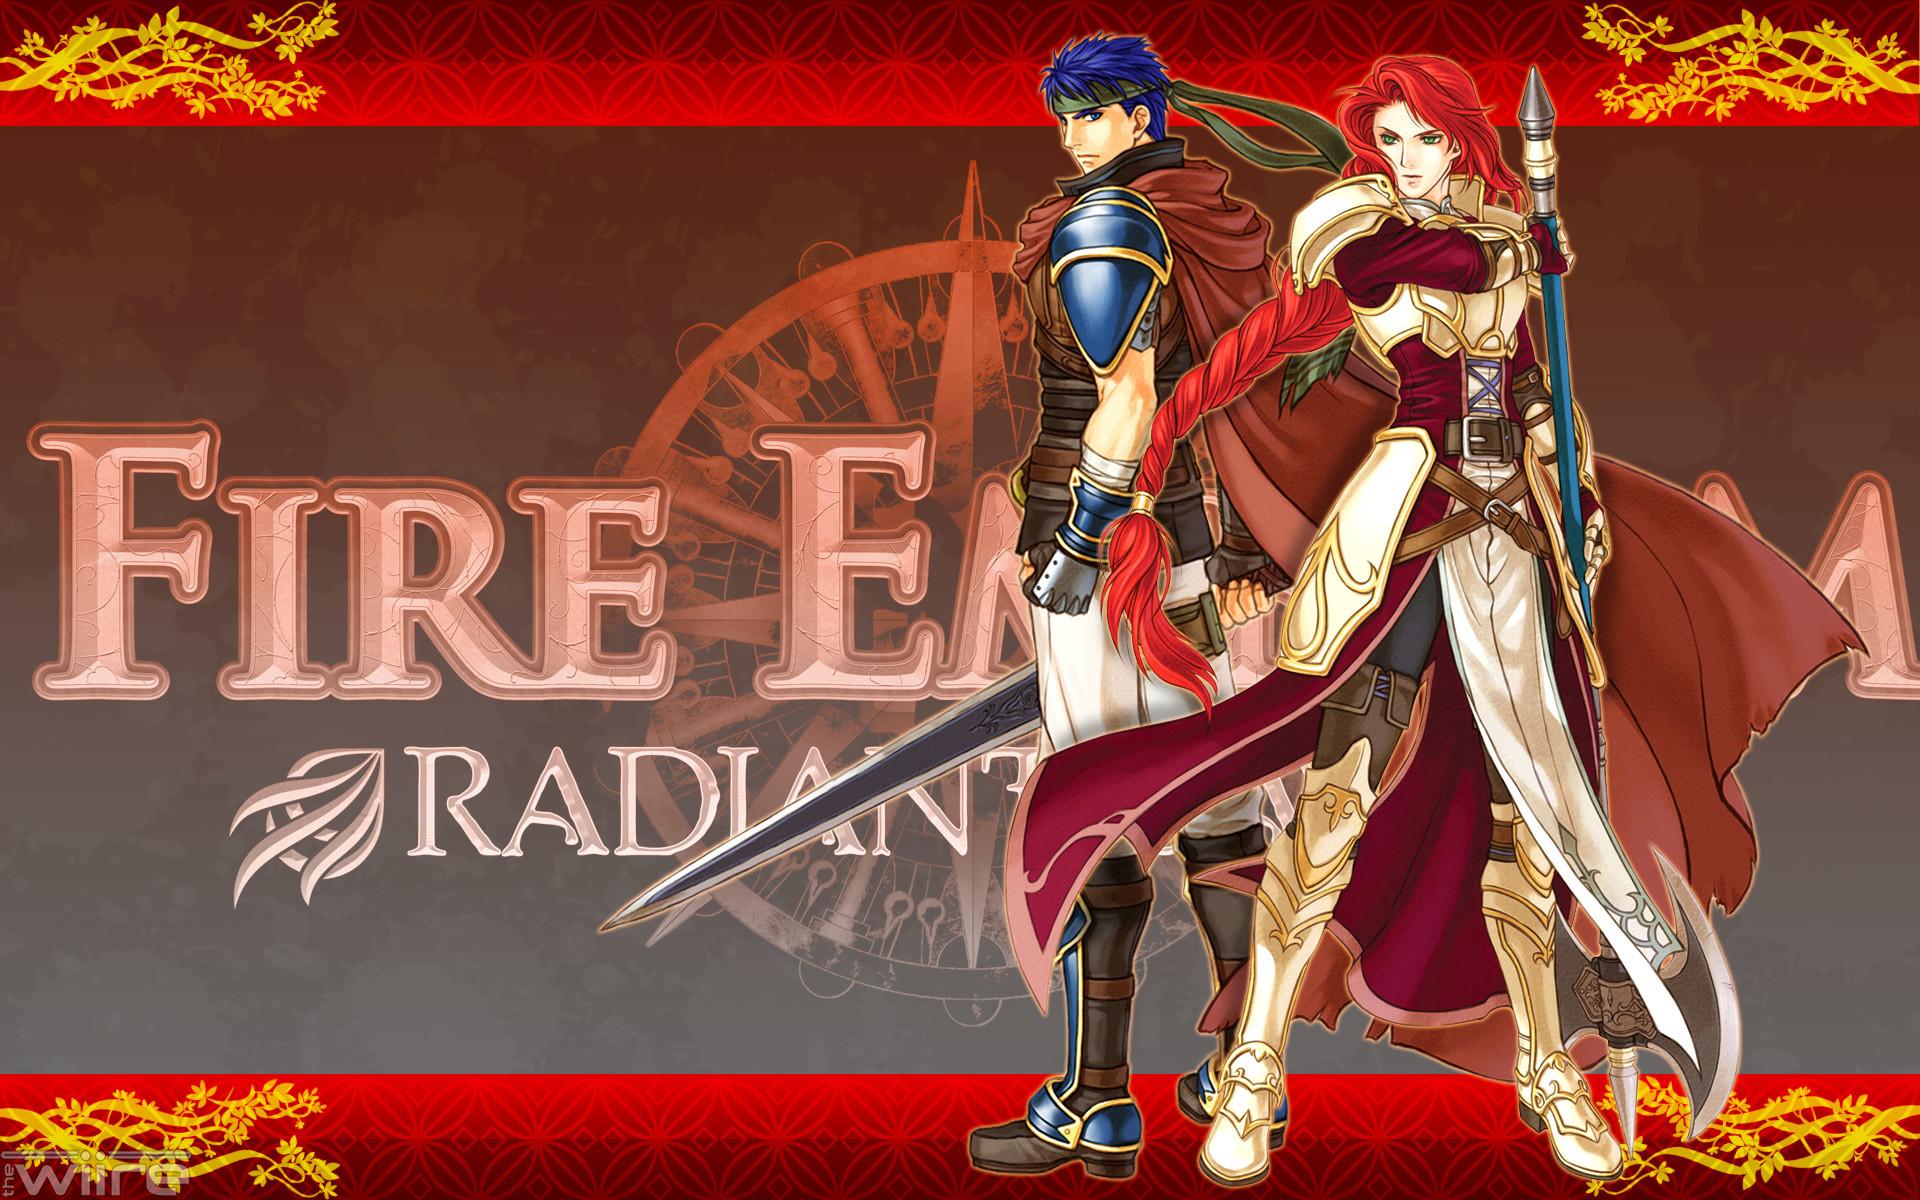 … fire emblem free anime wallpaper site …